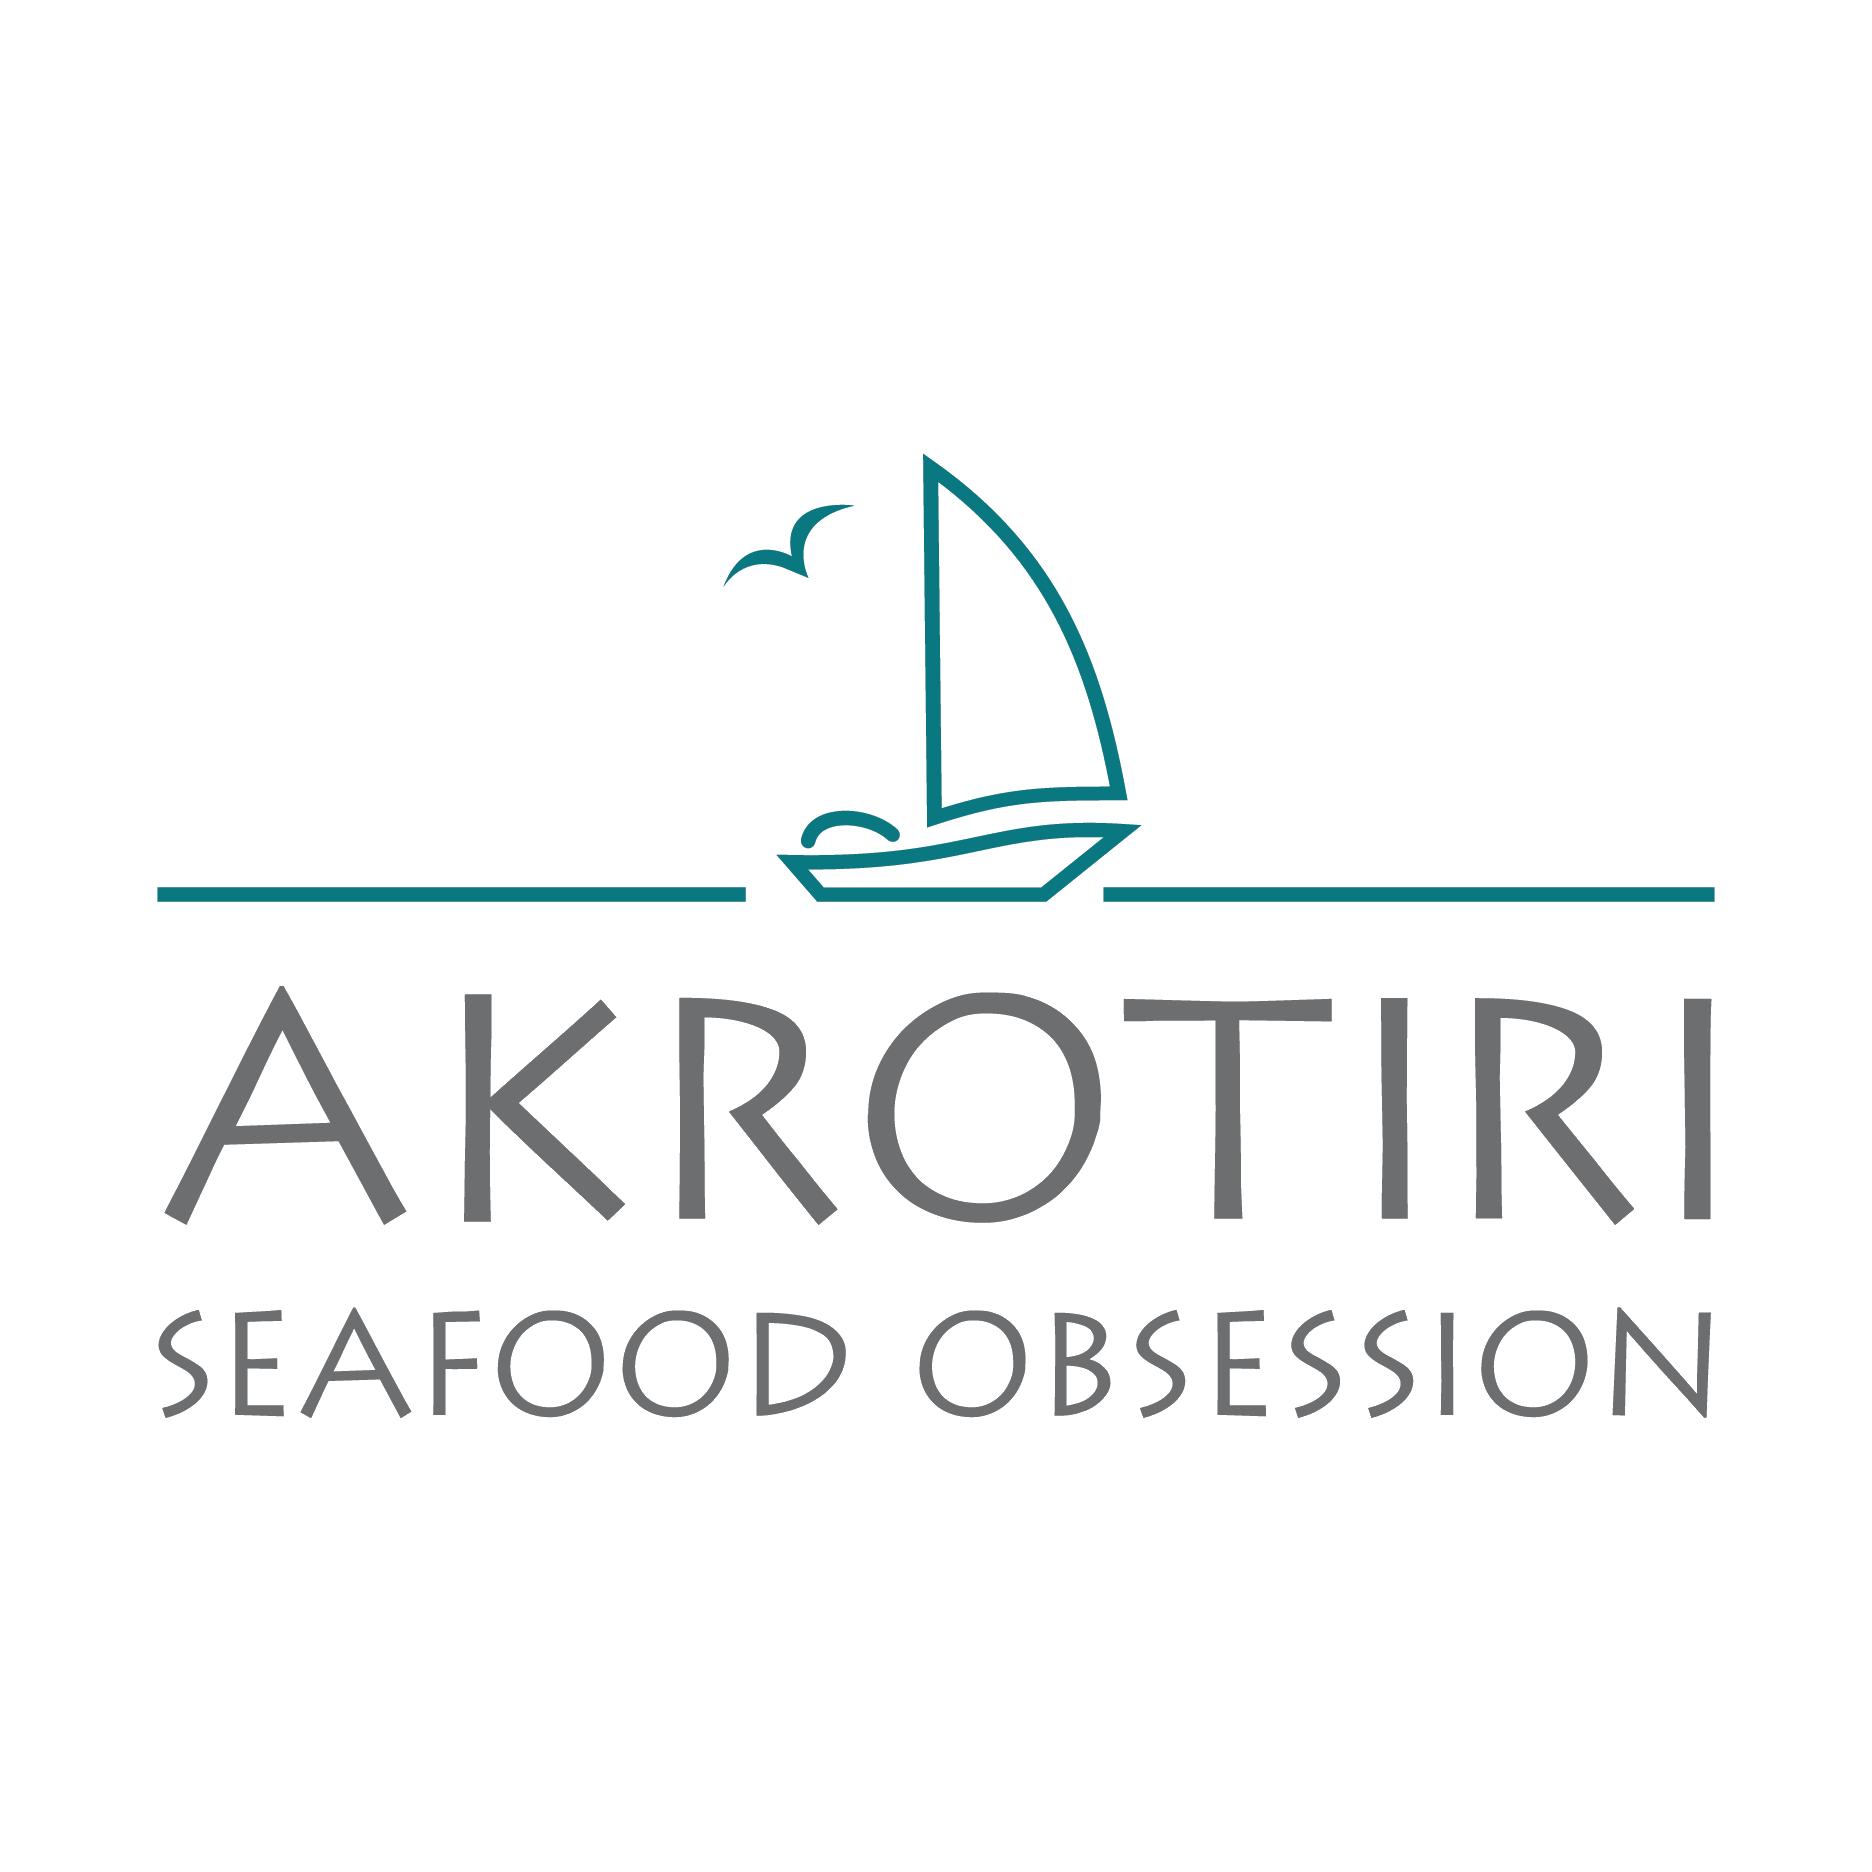 Akrotiri Seafood Obsession